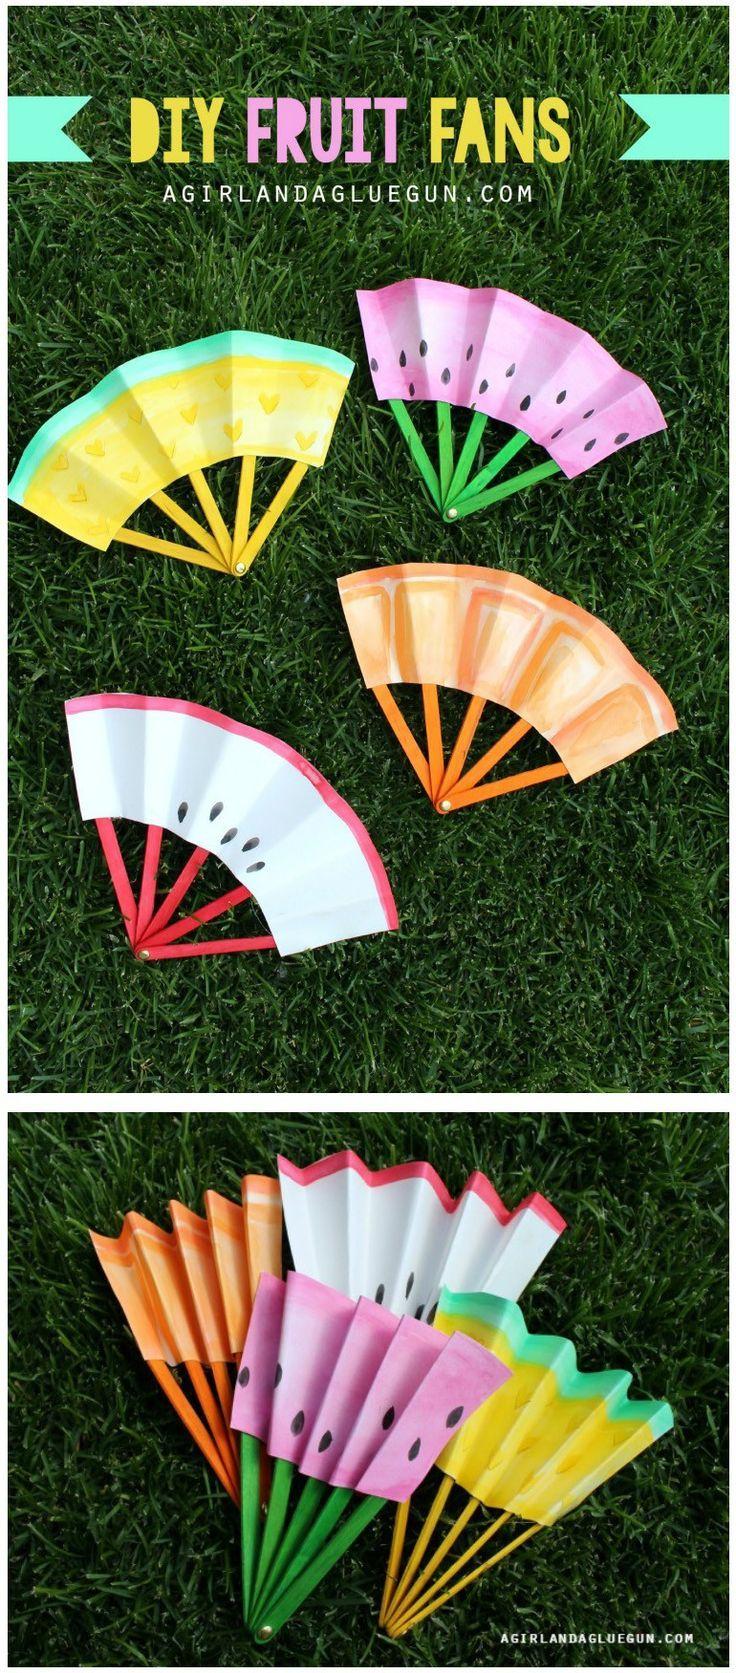 19 easy to make summer crafts for kids | summer crafts for